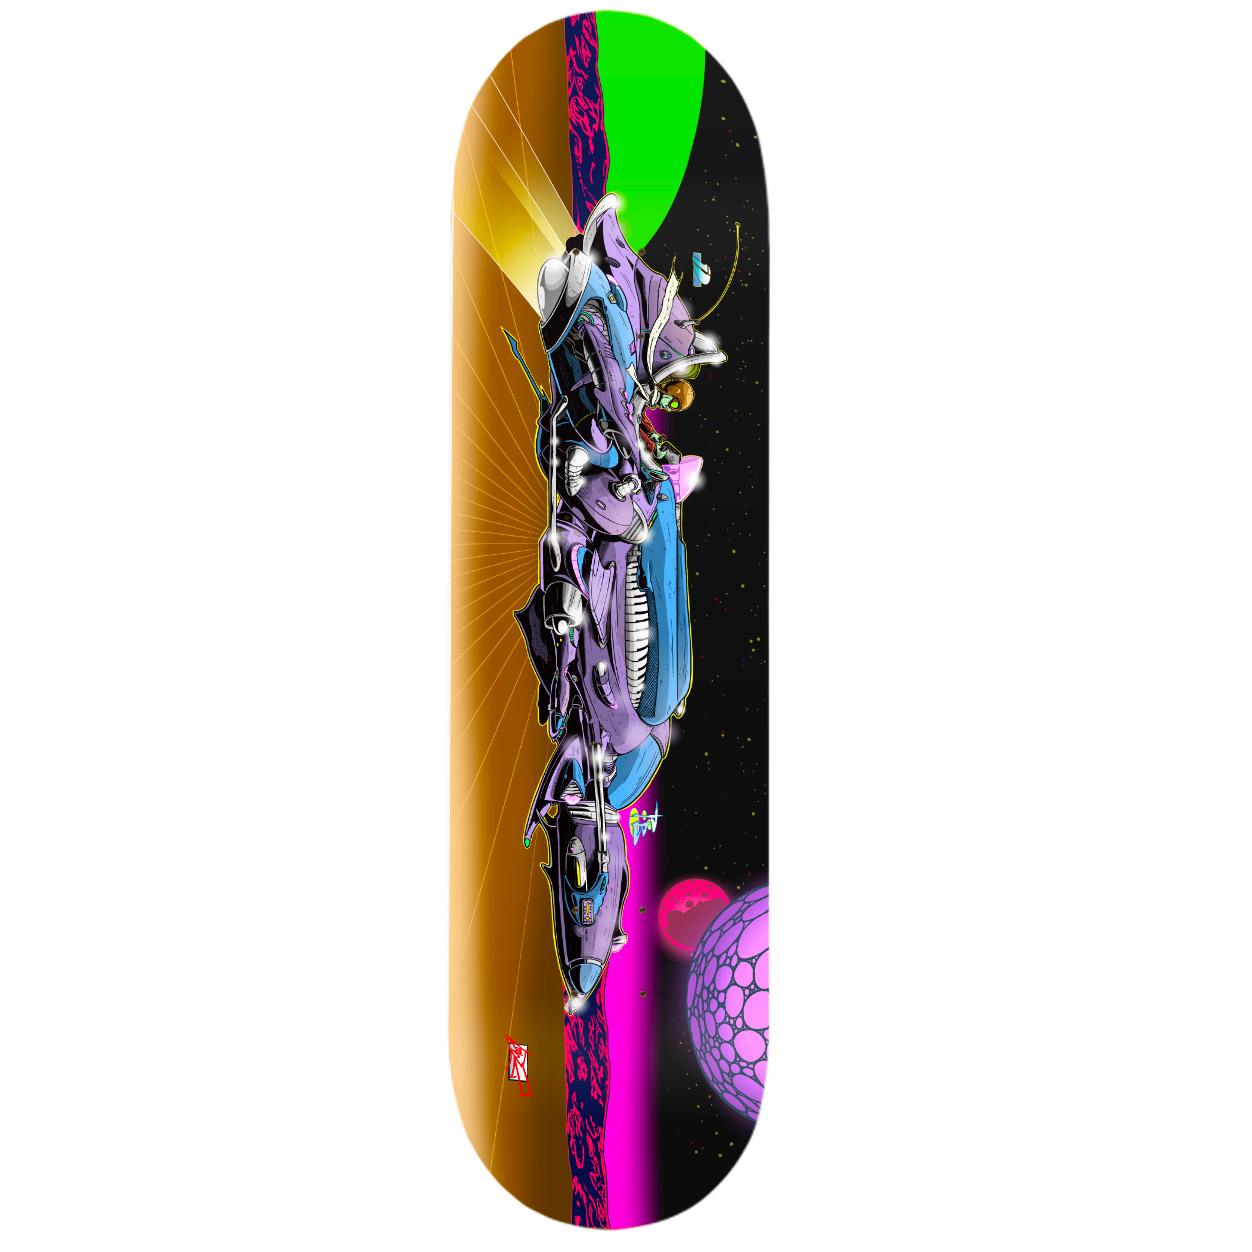 White skateboard - Tigerclaw Supplies - Spraying Board